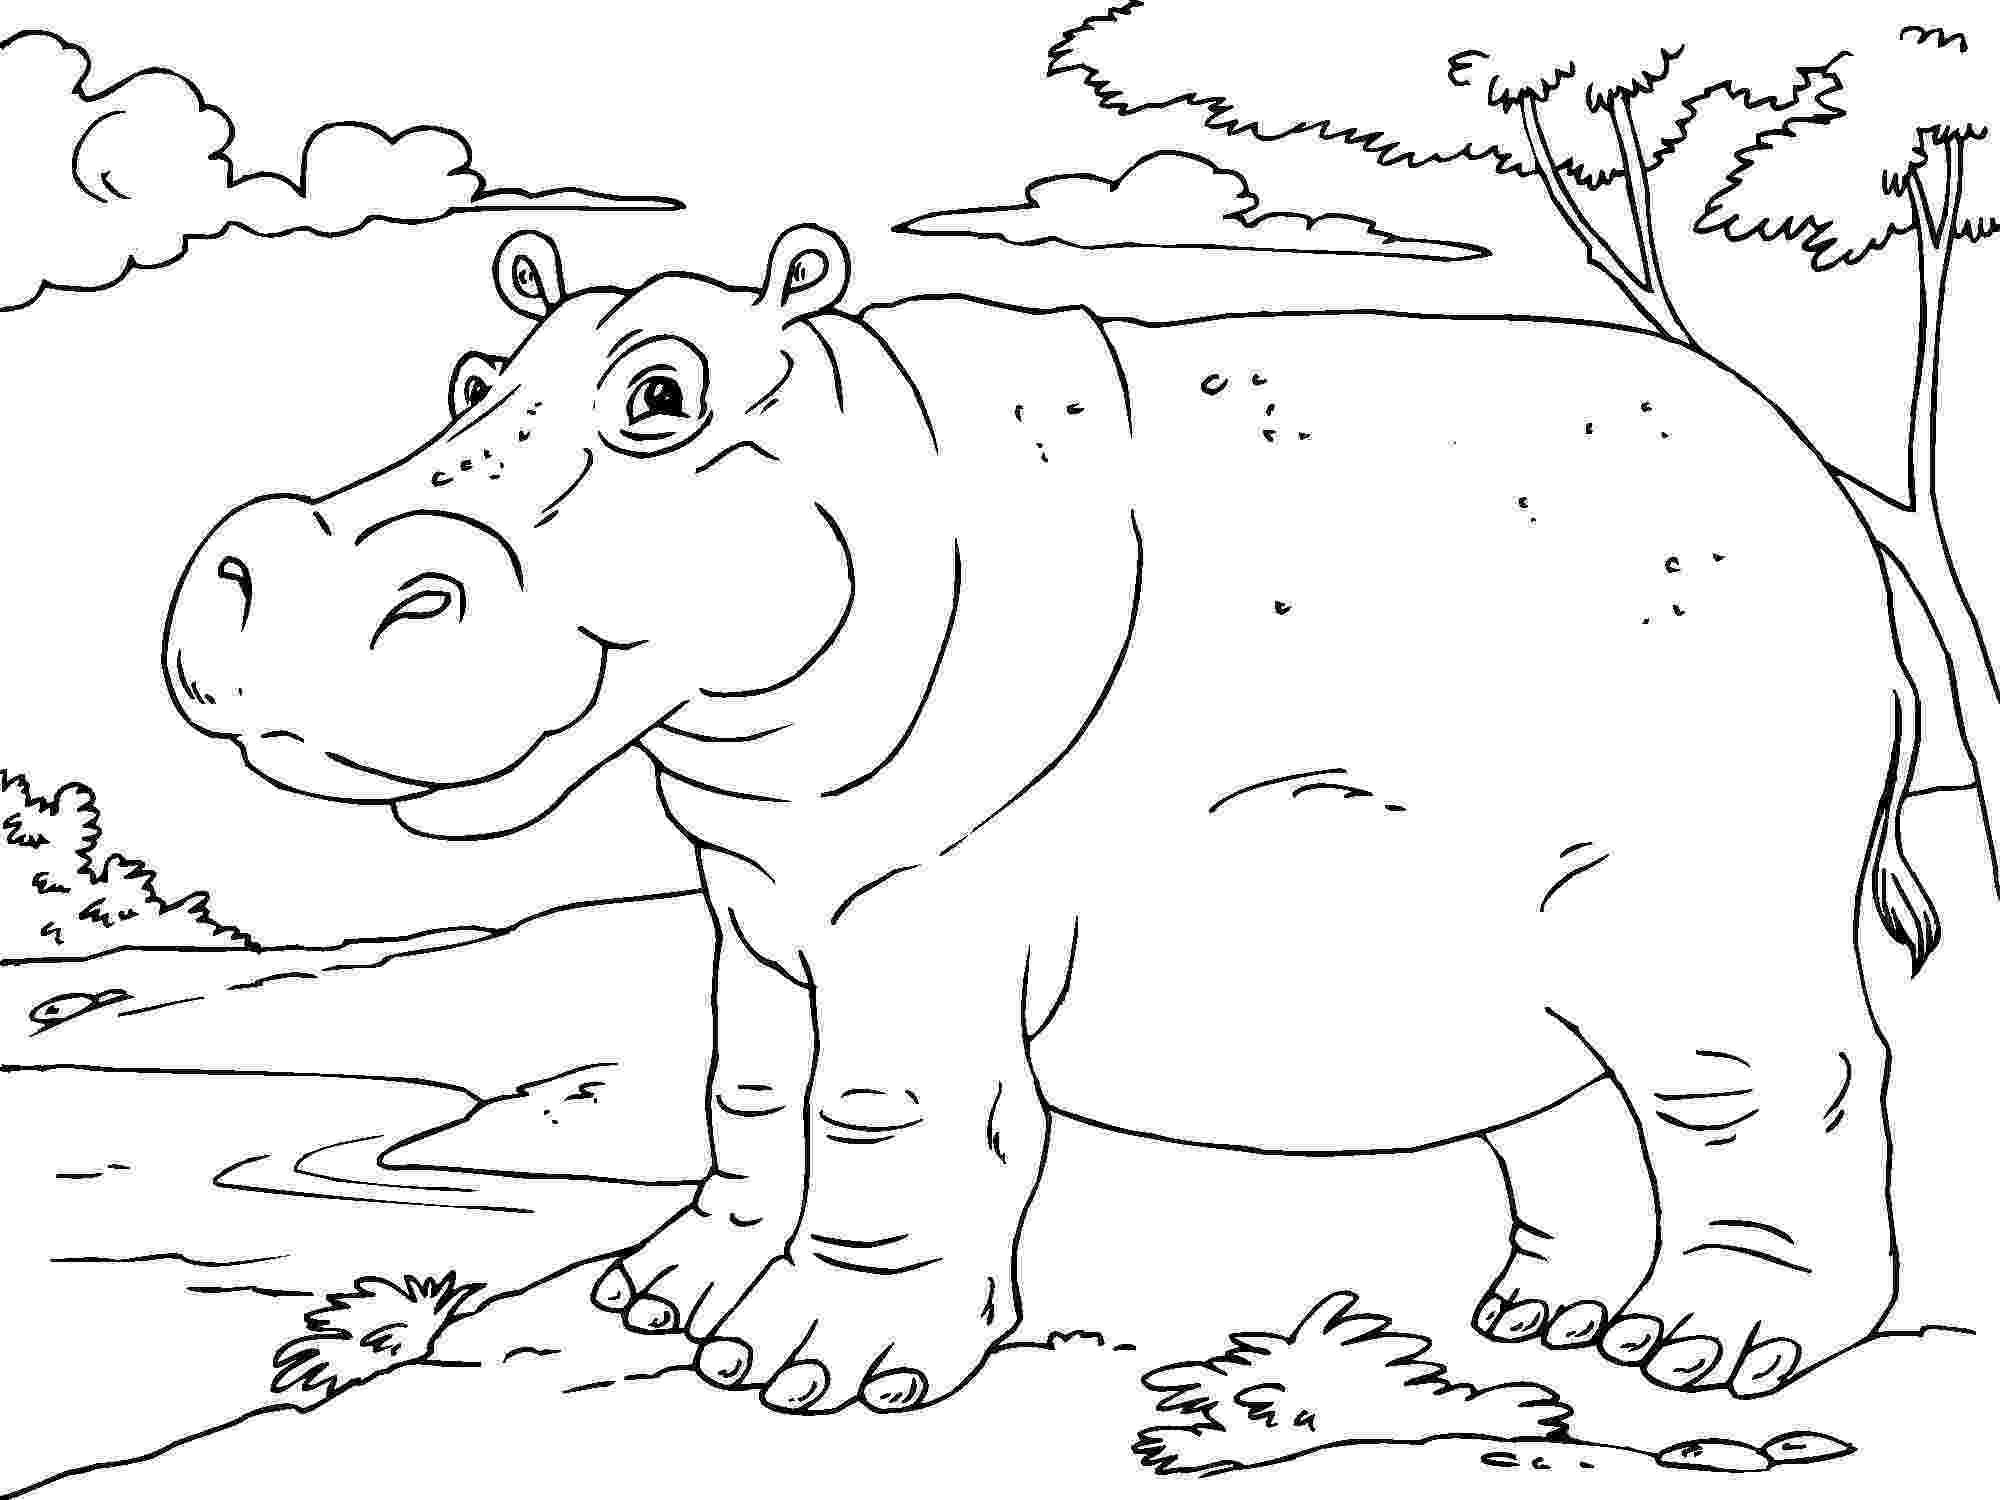 hippopotamus coloring page zoo hippopotamus coloring page wecoloringpagecom coloring page hippopotamus